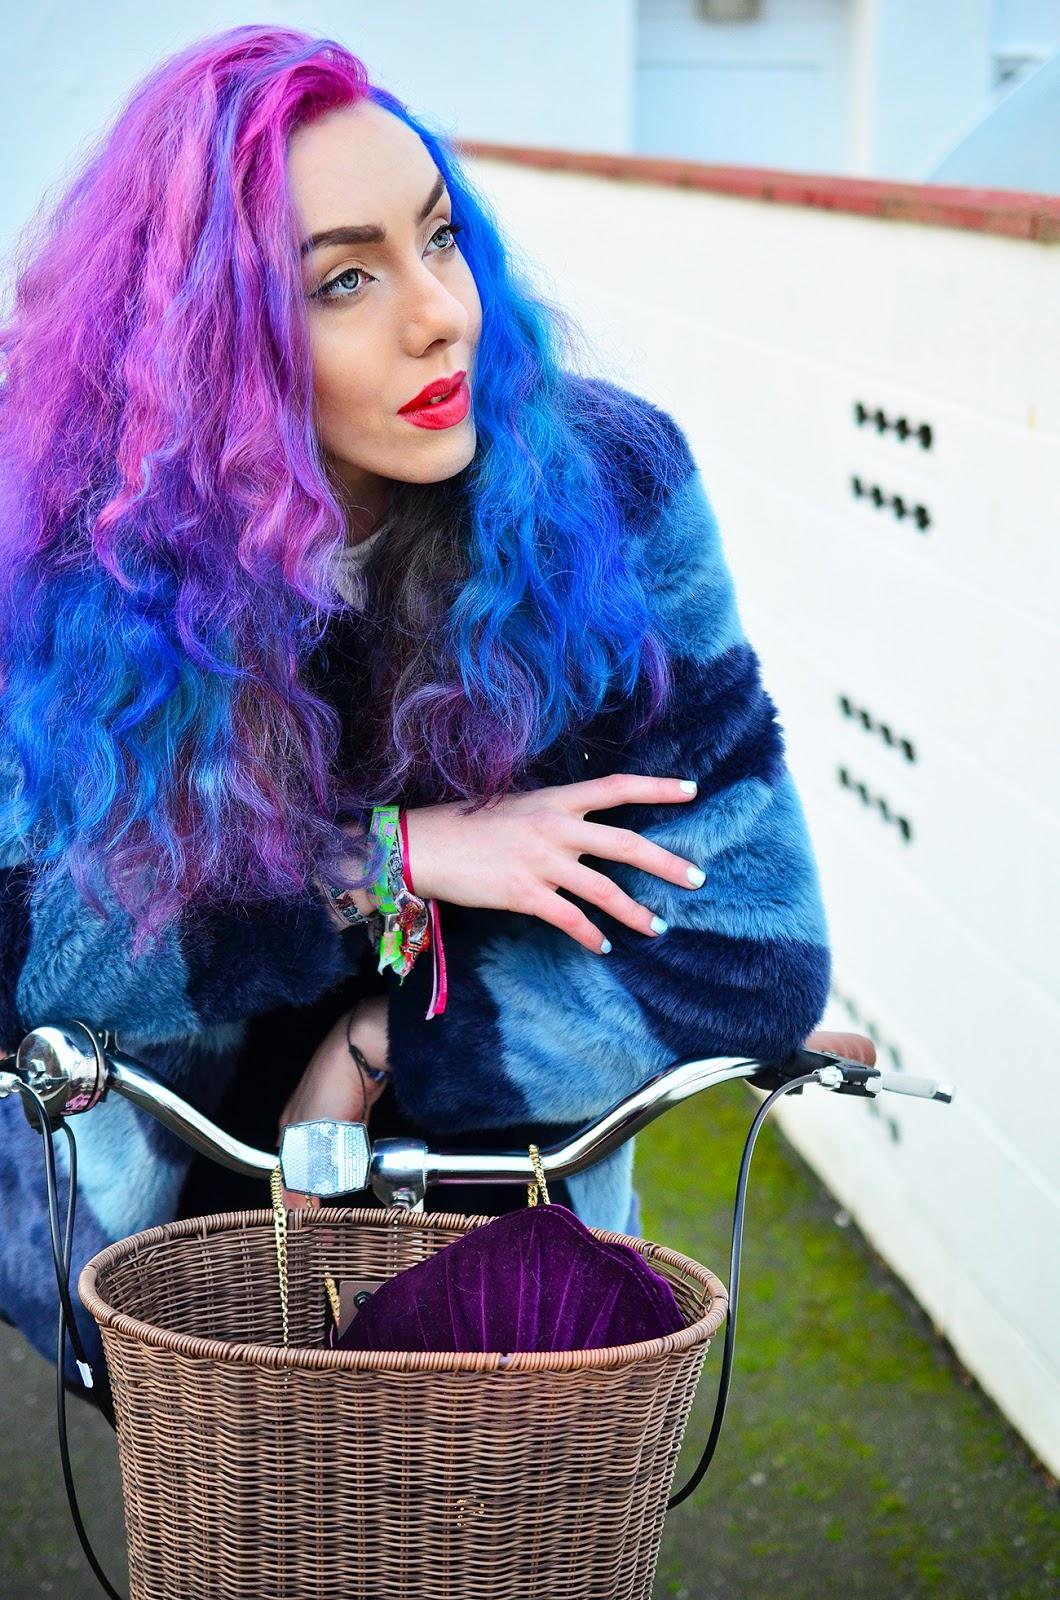 Stephi LaReine Liverpool Fashion Lifestyle Blogger